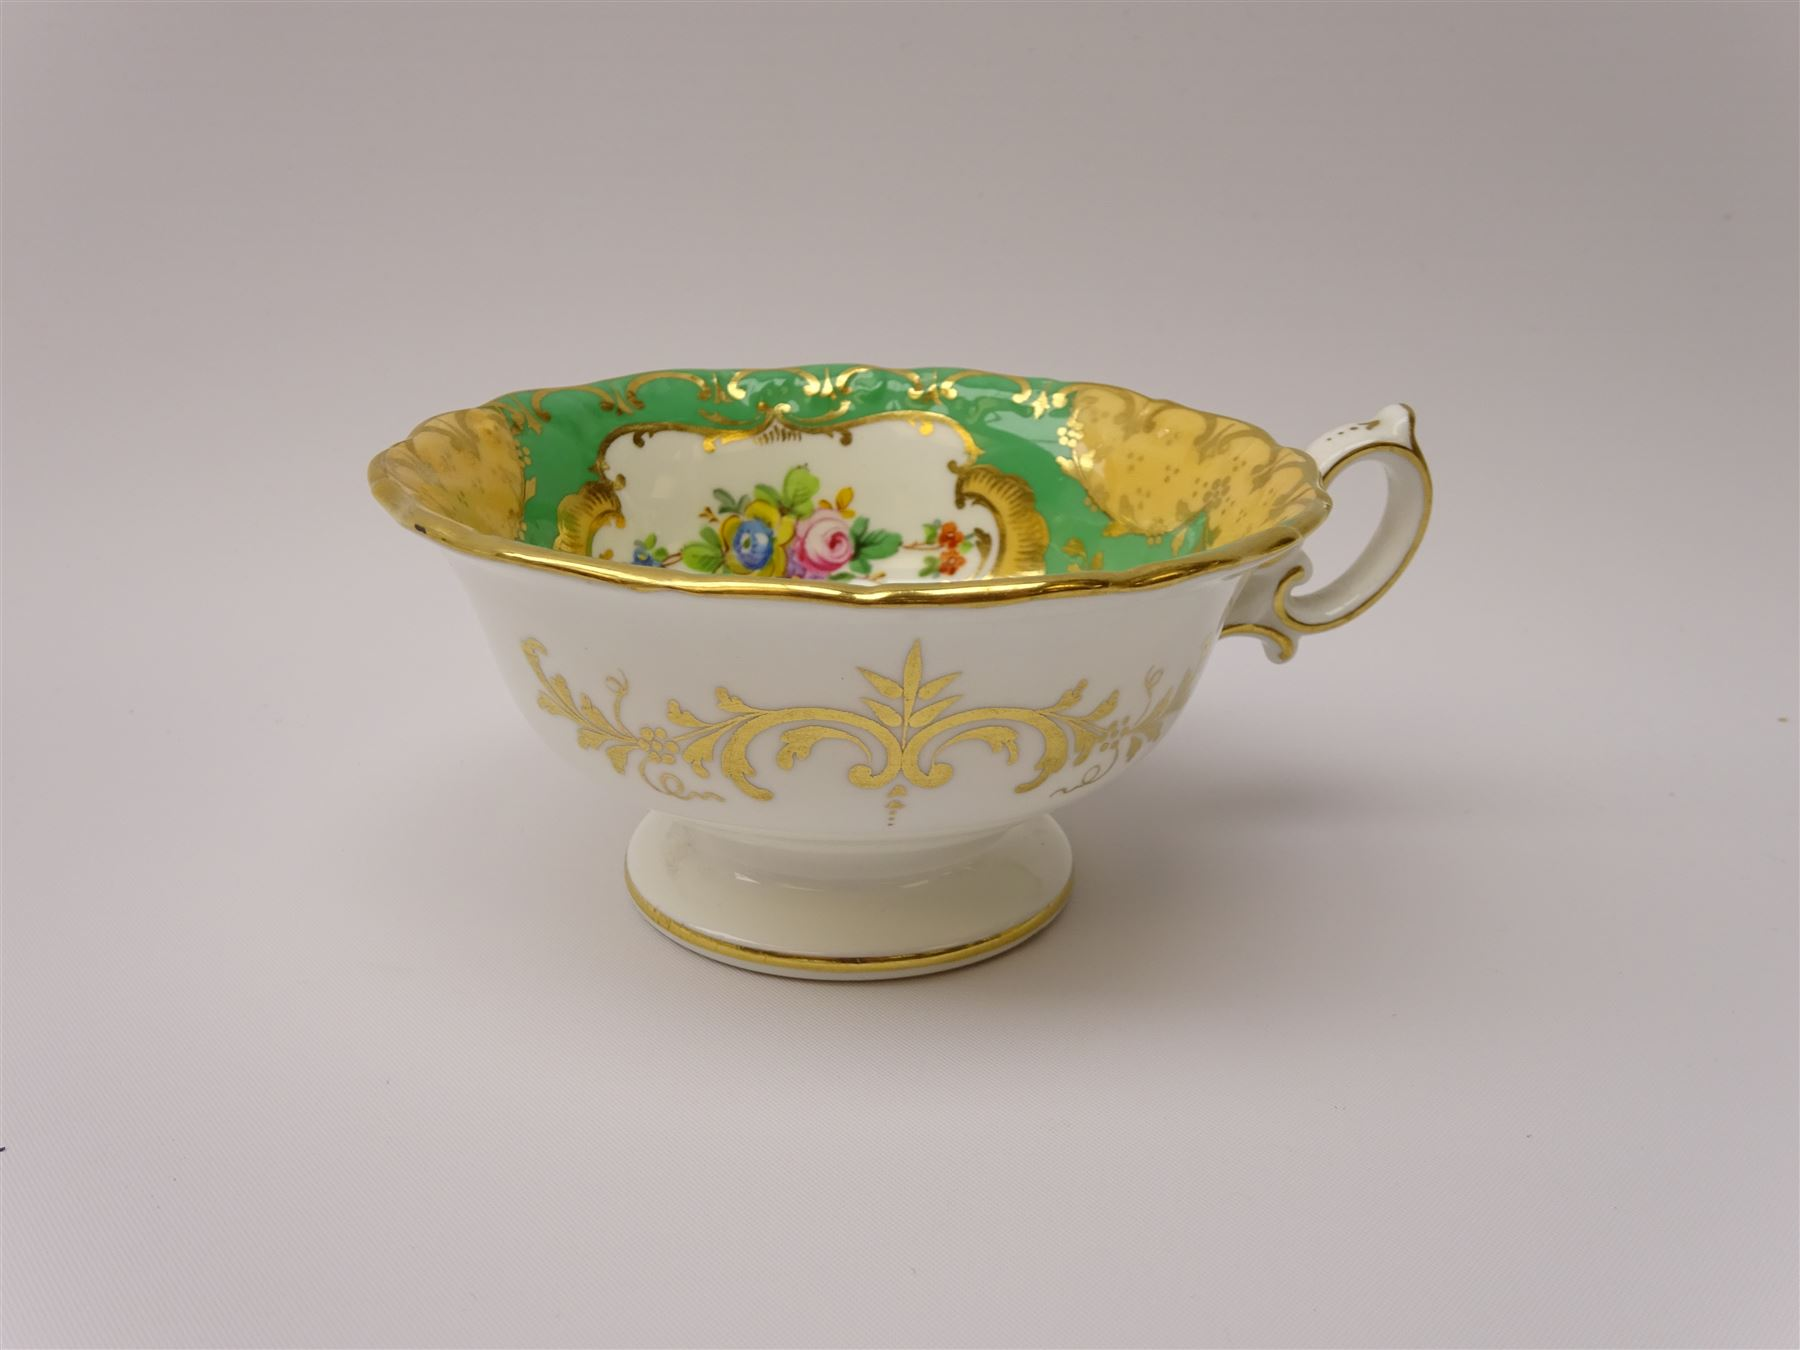 19th century Minton tea set - Image 3 of 12